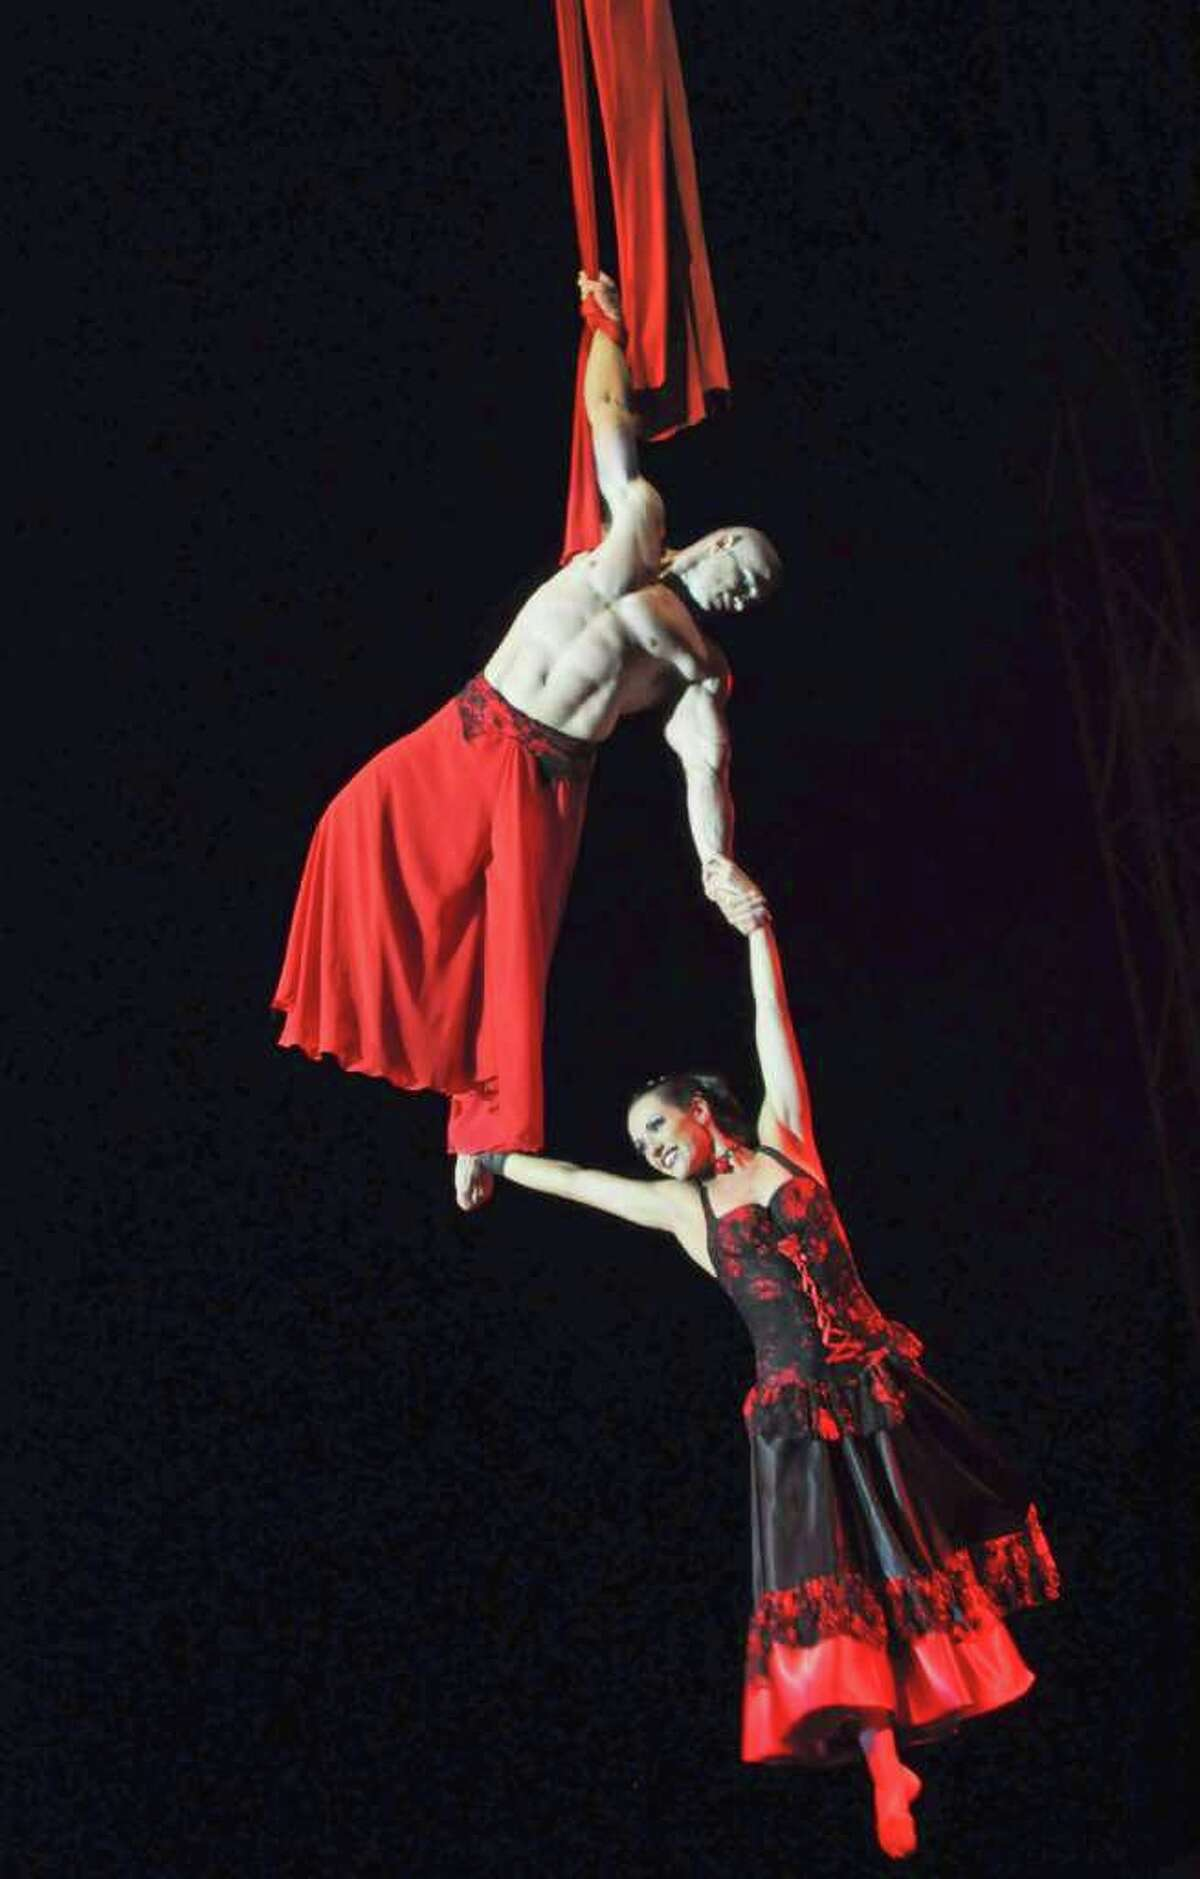 Havana is hosting the 10th International Festival of Circus